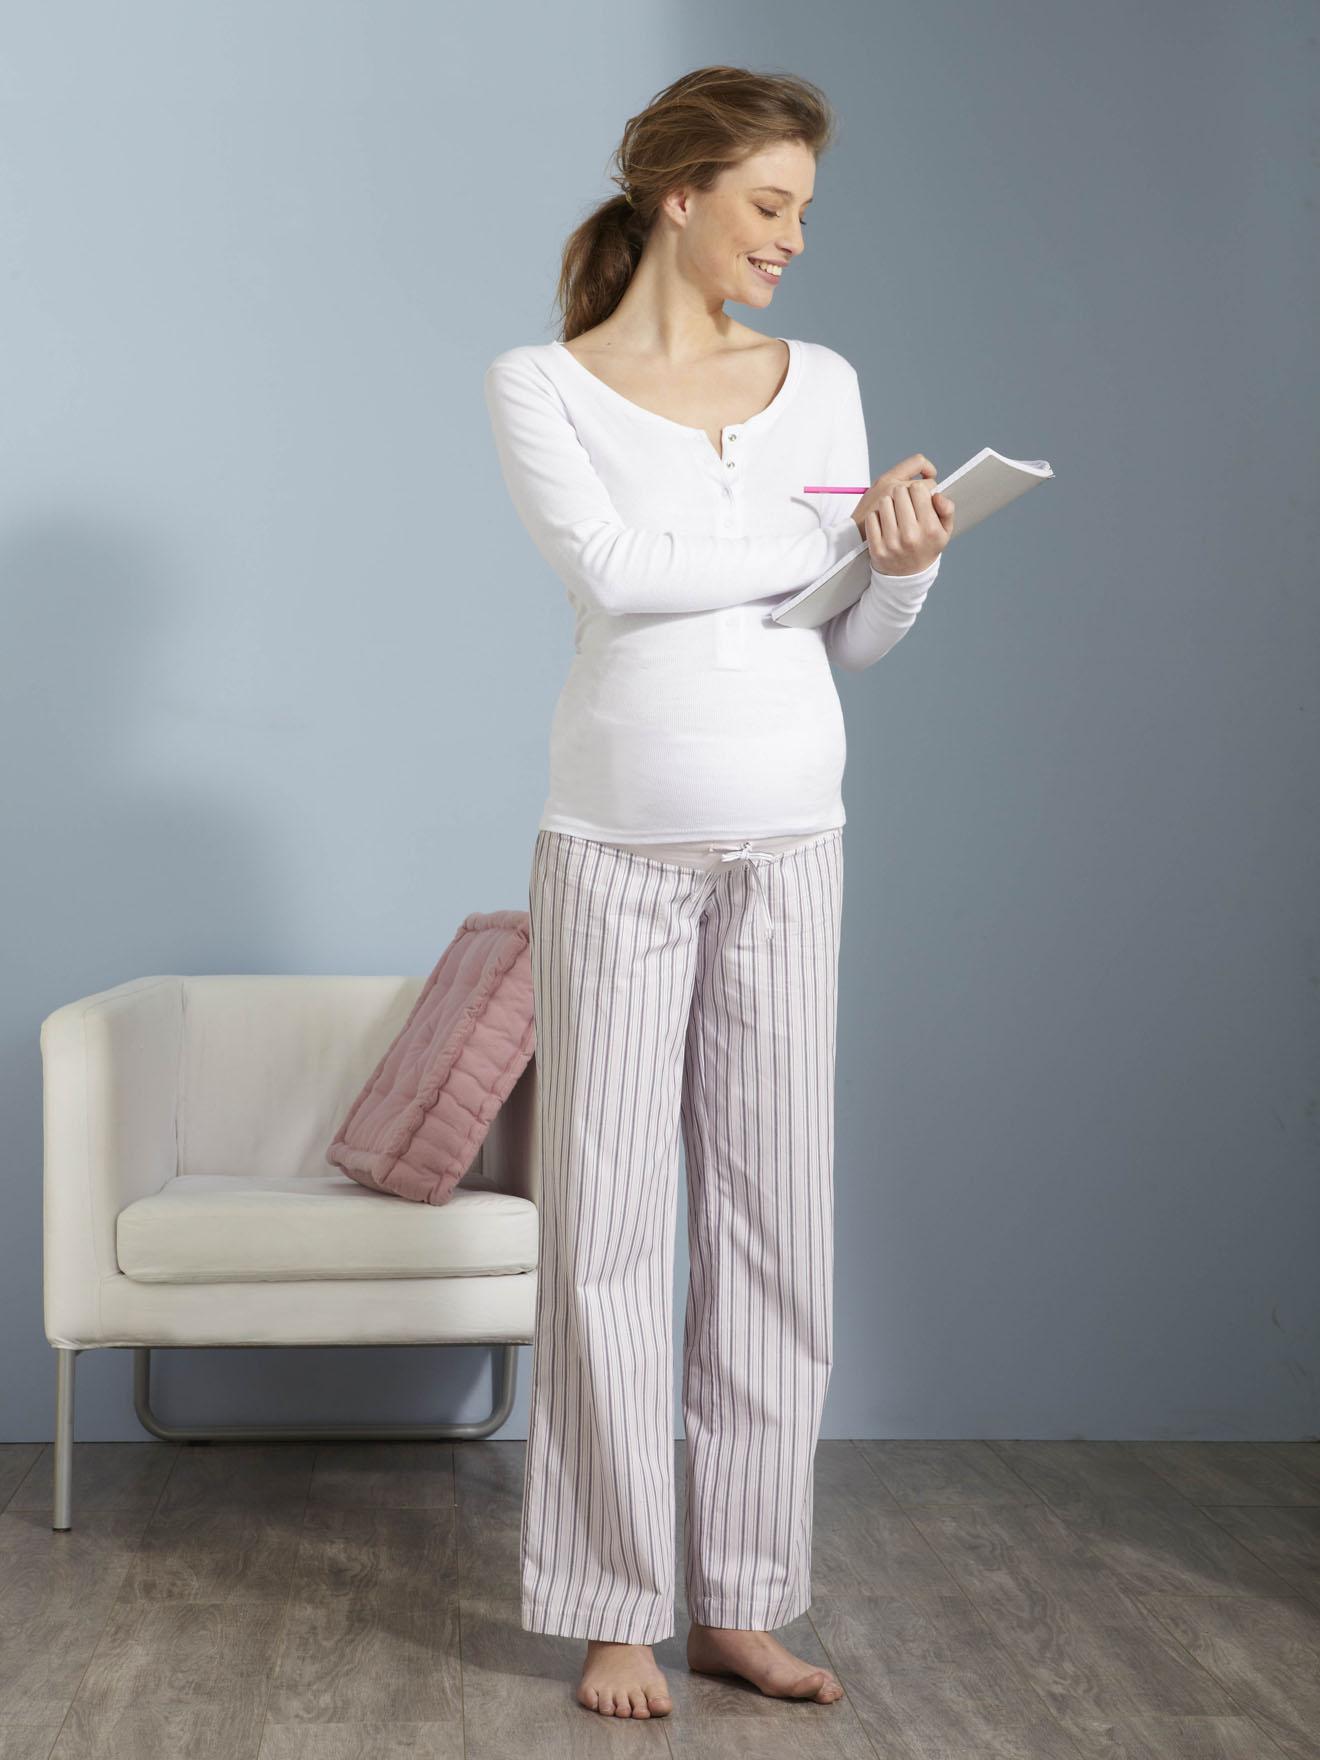 Vertbaudet   Ropa premamá: moda para embarazadas   Page 8